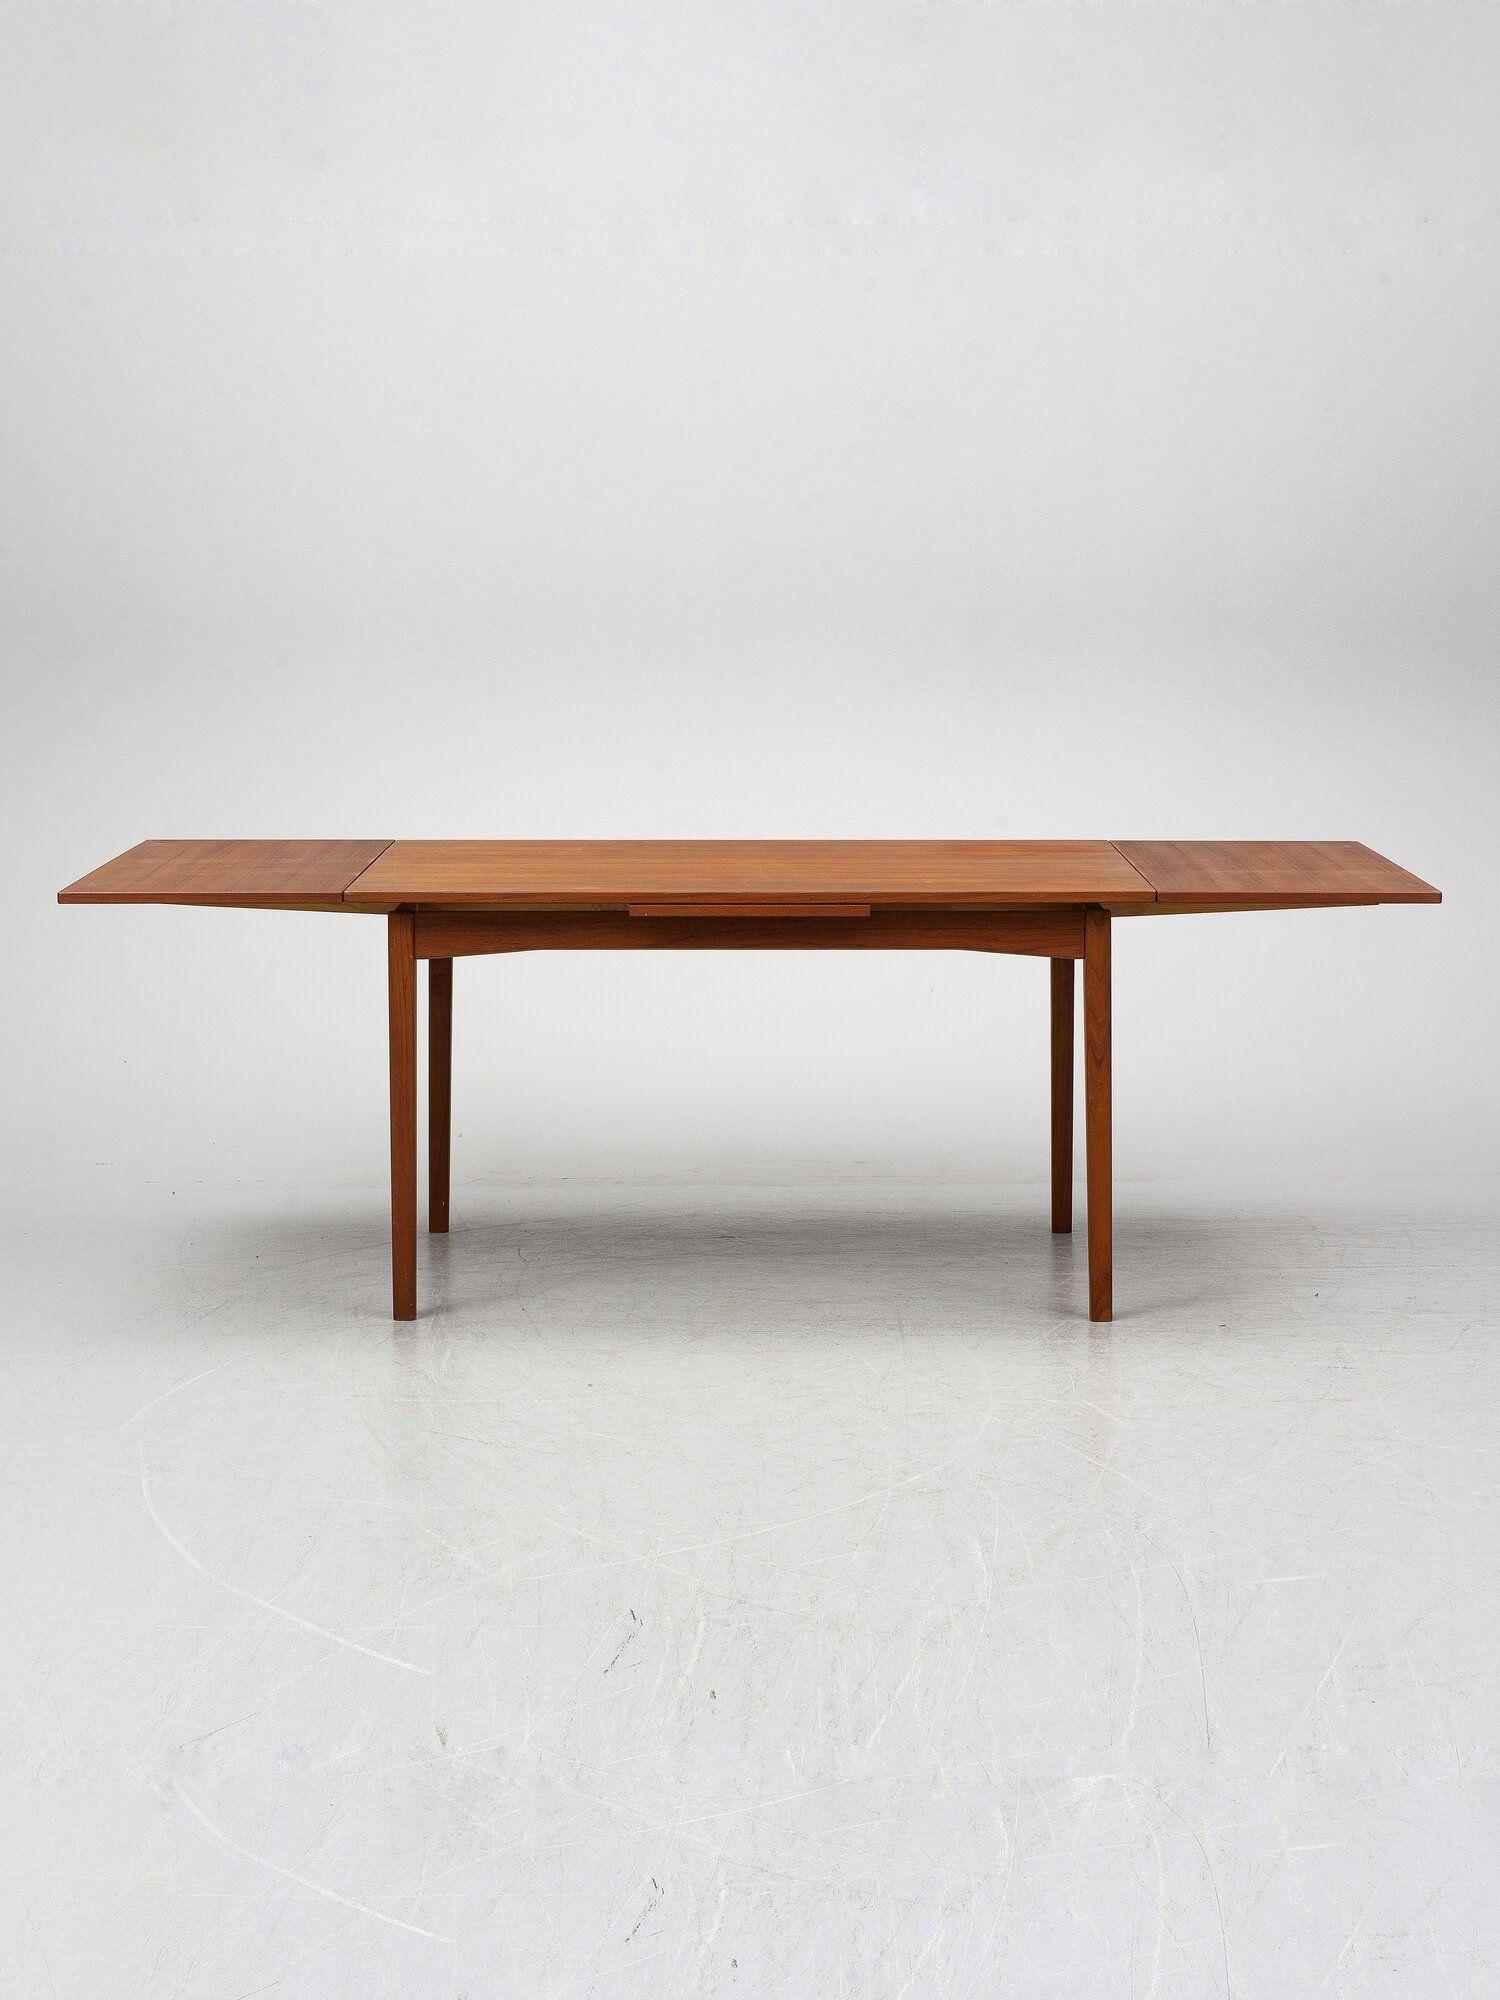 Midcentury Expandable Teak Dining Table Made In Sweden Midcentury Scandinavian Vintage Furnitur In 2020 Teak Dining Table Dining Table Vintage Scandinavian Furniture